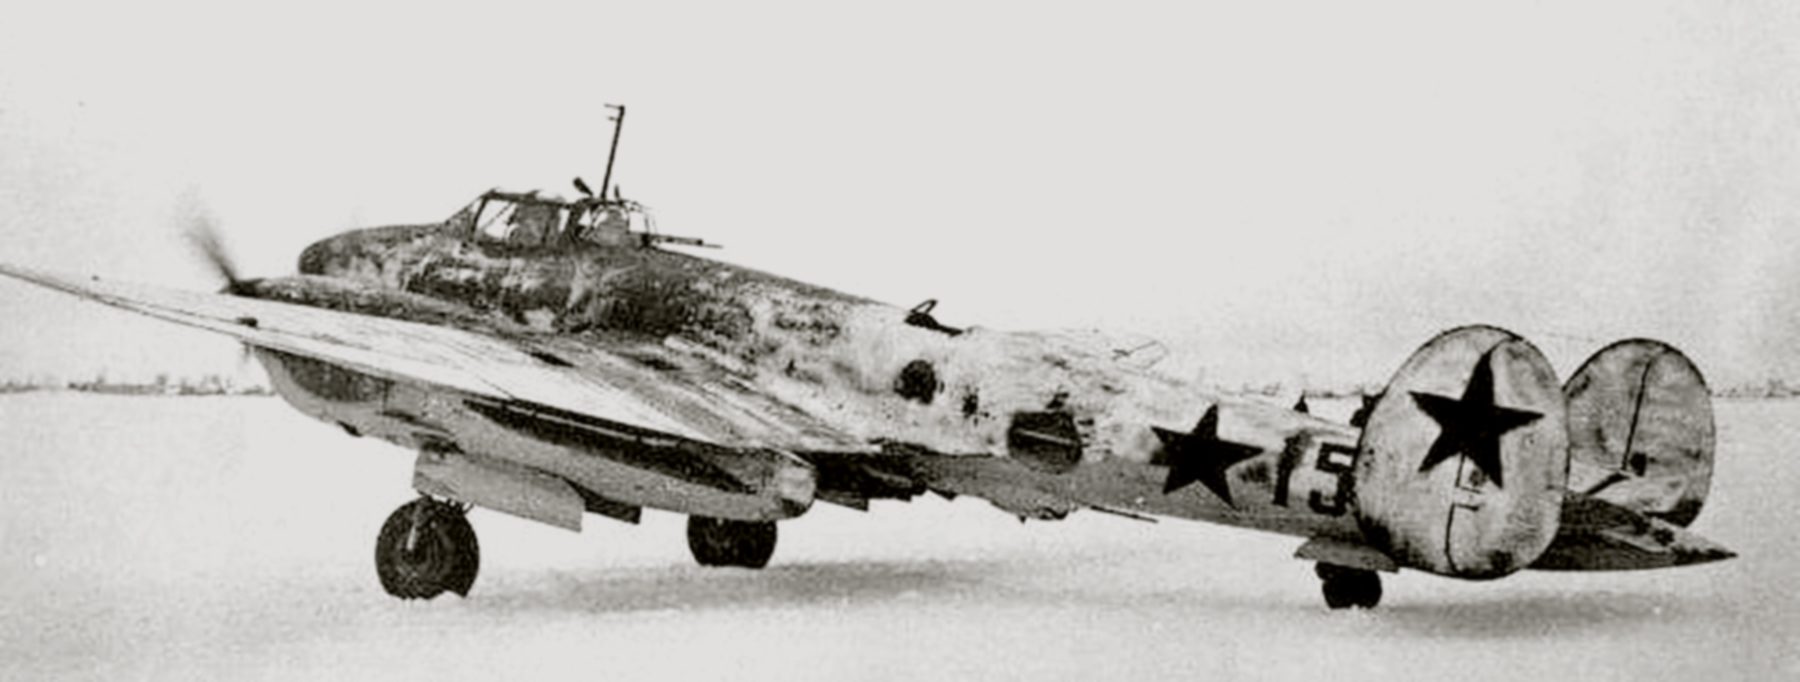 Petlyakov Pe 2 type 110 with 73PBAP Baltic Fleet Red 15 in winter camouflage 1942 01